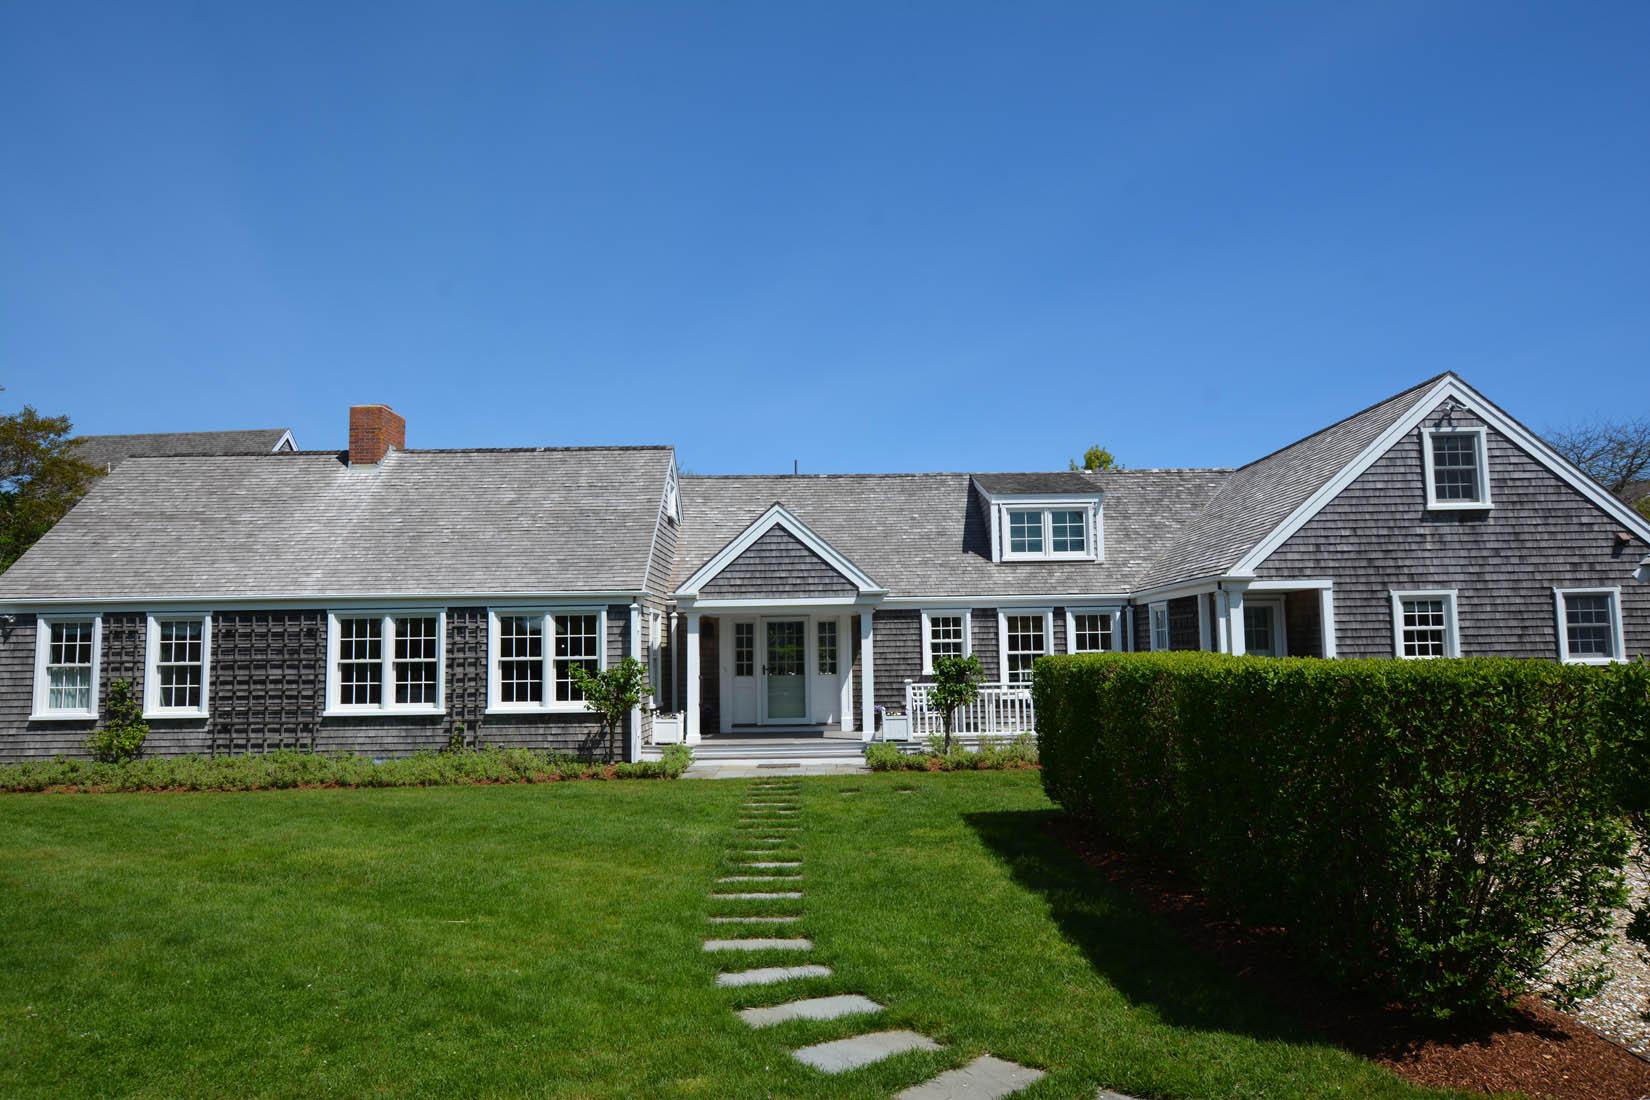 13 North Star Lane, Nantucket, Massachusetts, 02554, 5 Bedrooms Bedrooms, ,5 BathroomsBathrooms,Residential,For Sale,13 North Star Lane,21907366